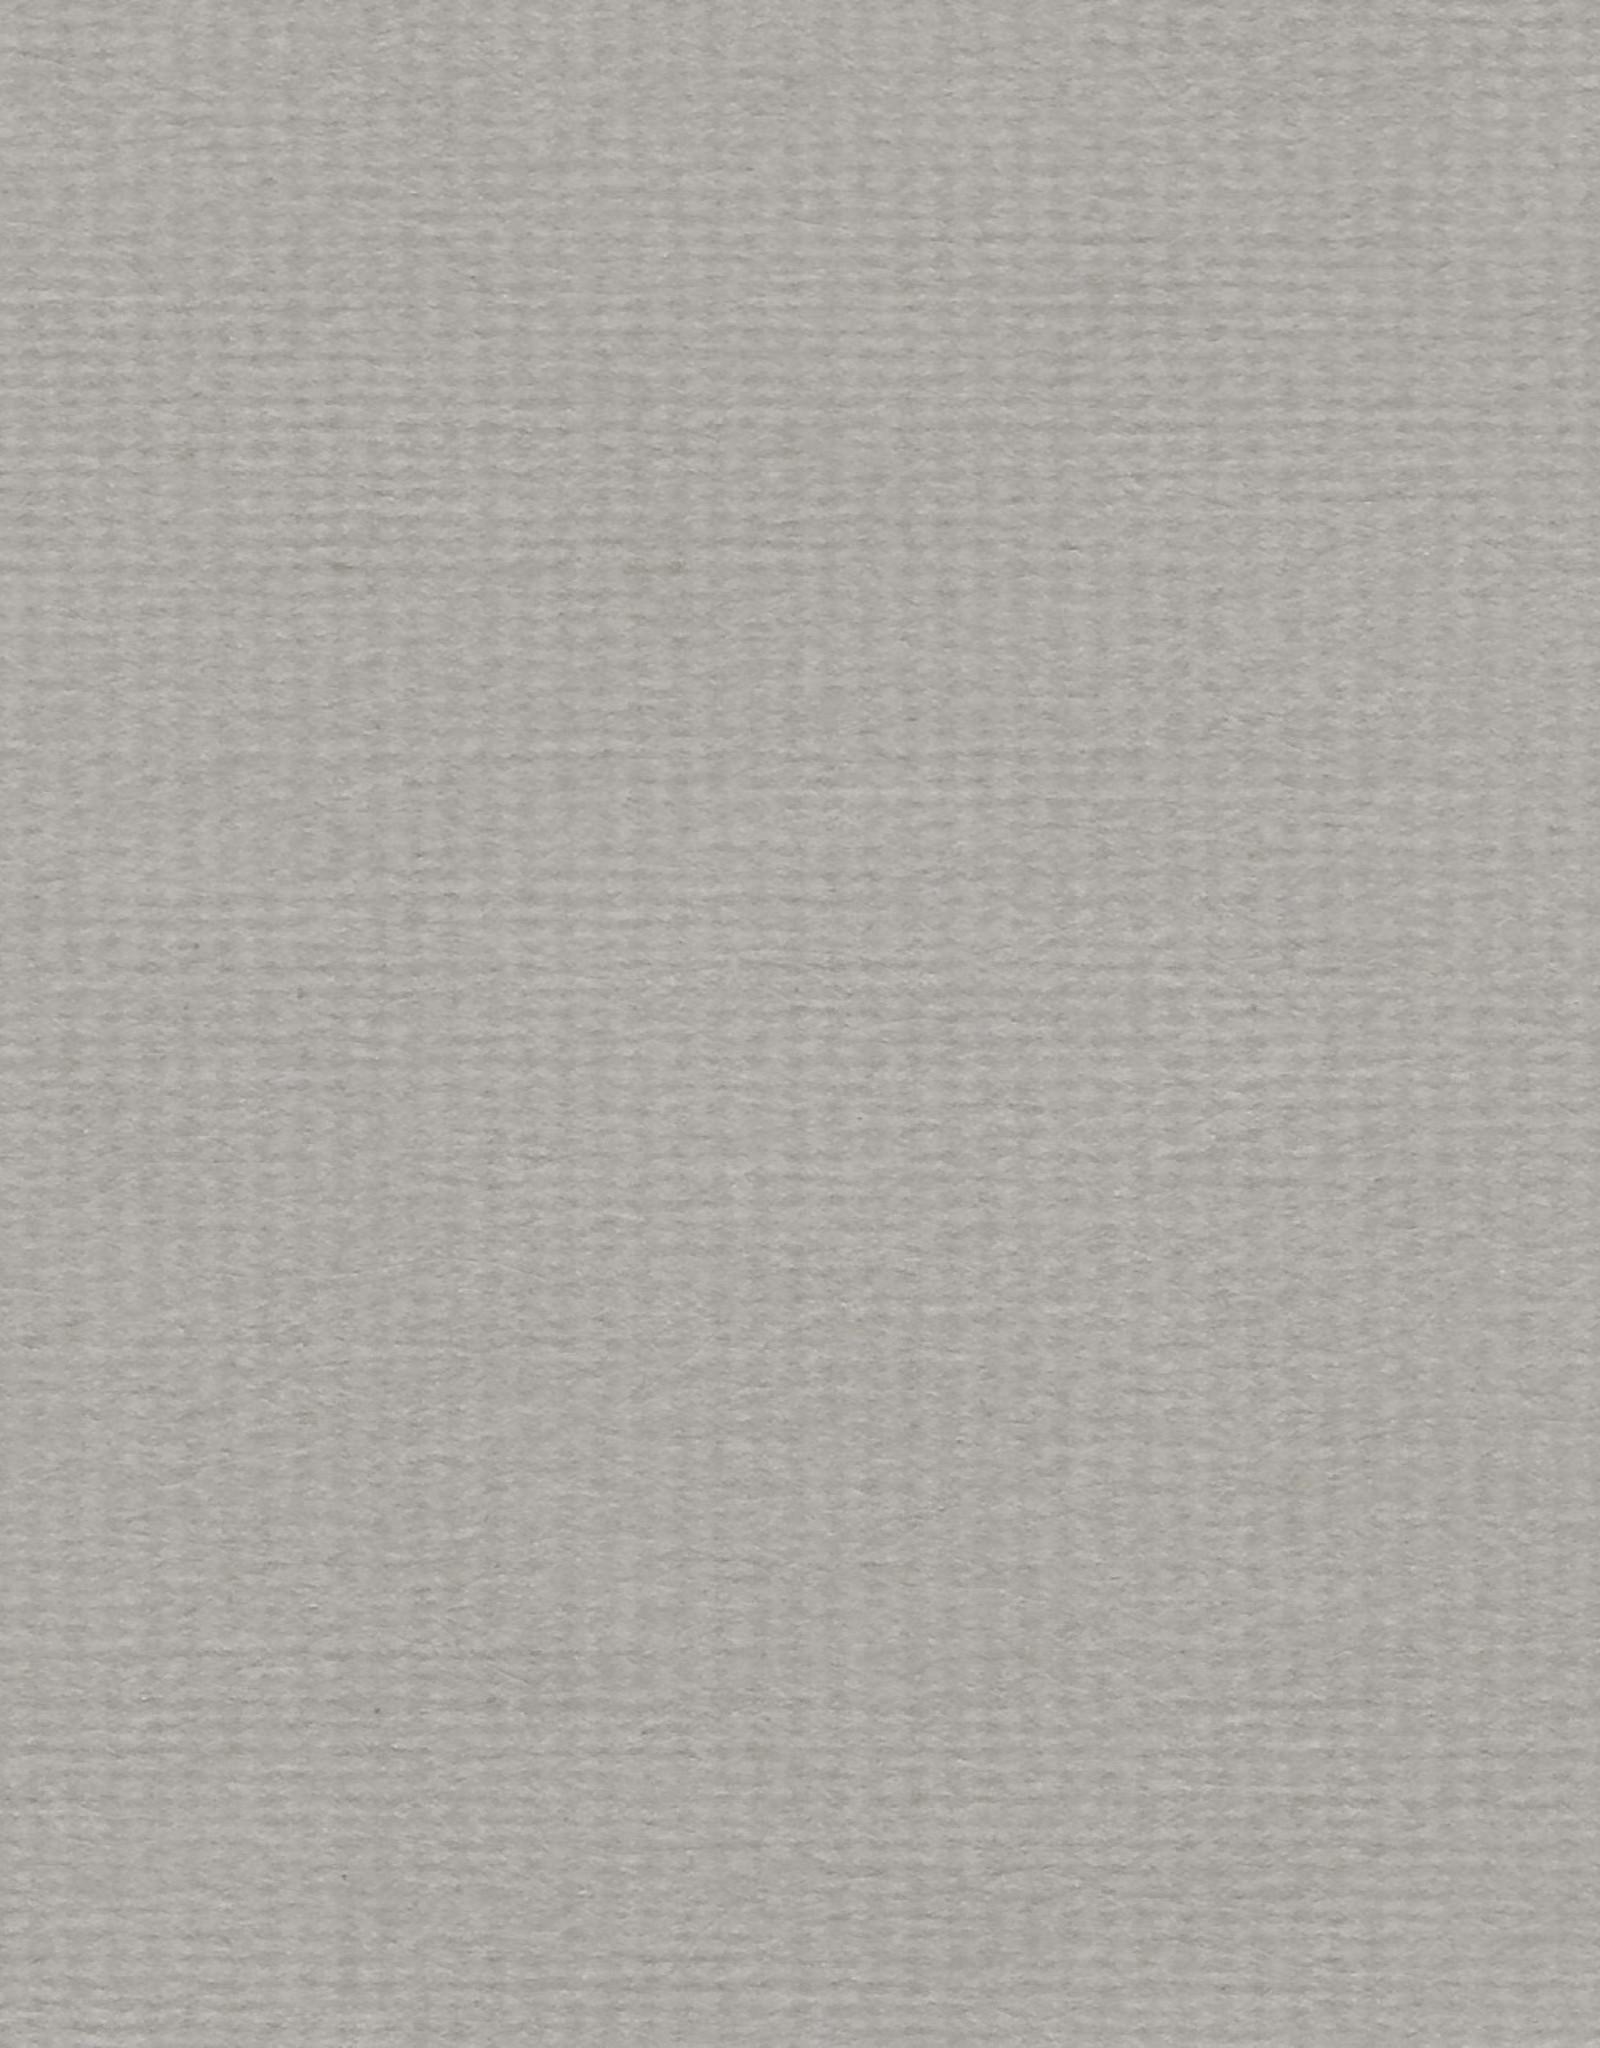 "Hahnemuhle Bugra, Grey #306, 33"" x 41"" 130 gsm"